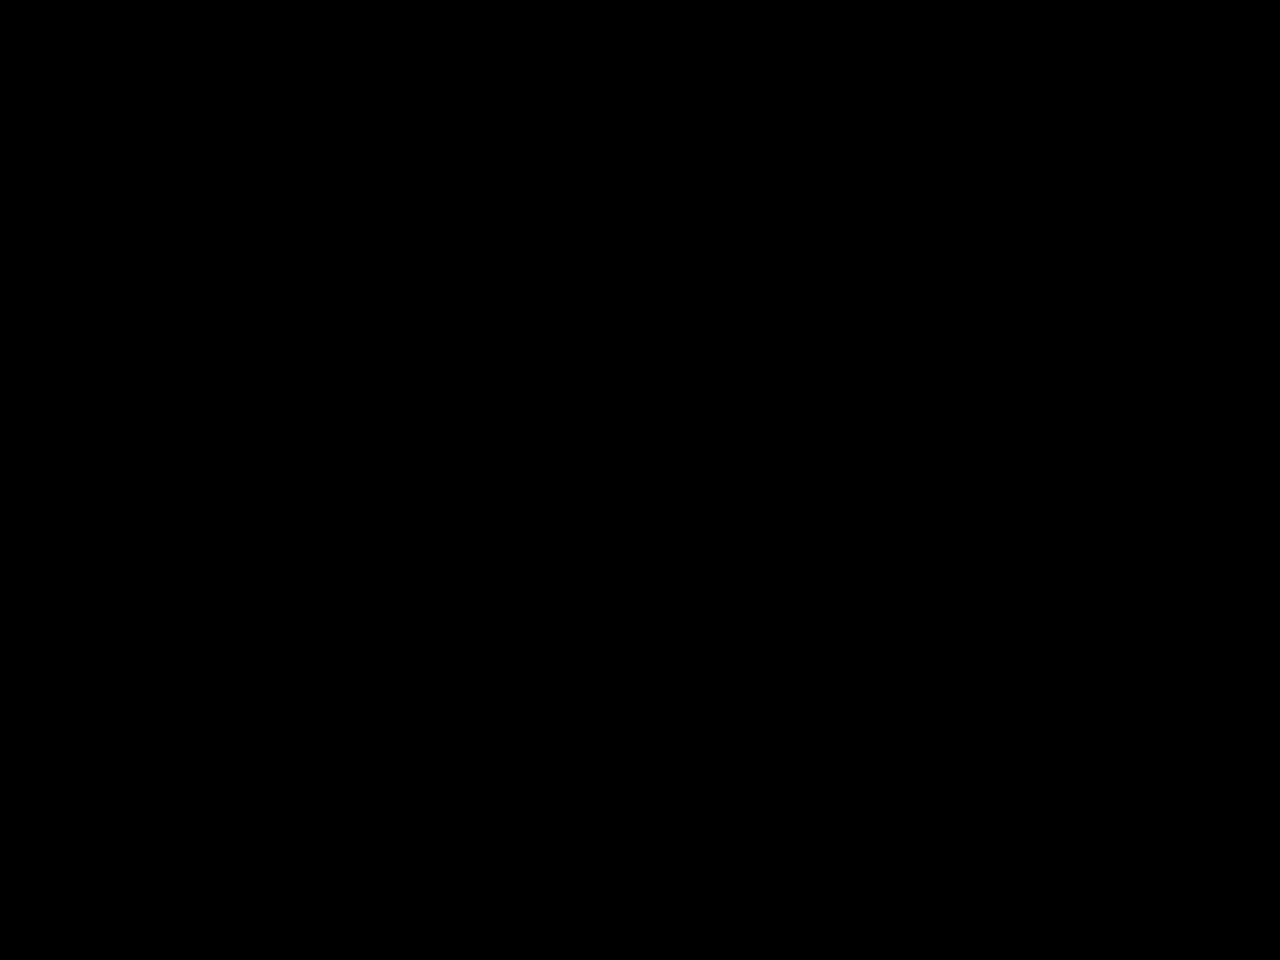 UYU(TUL)MAK